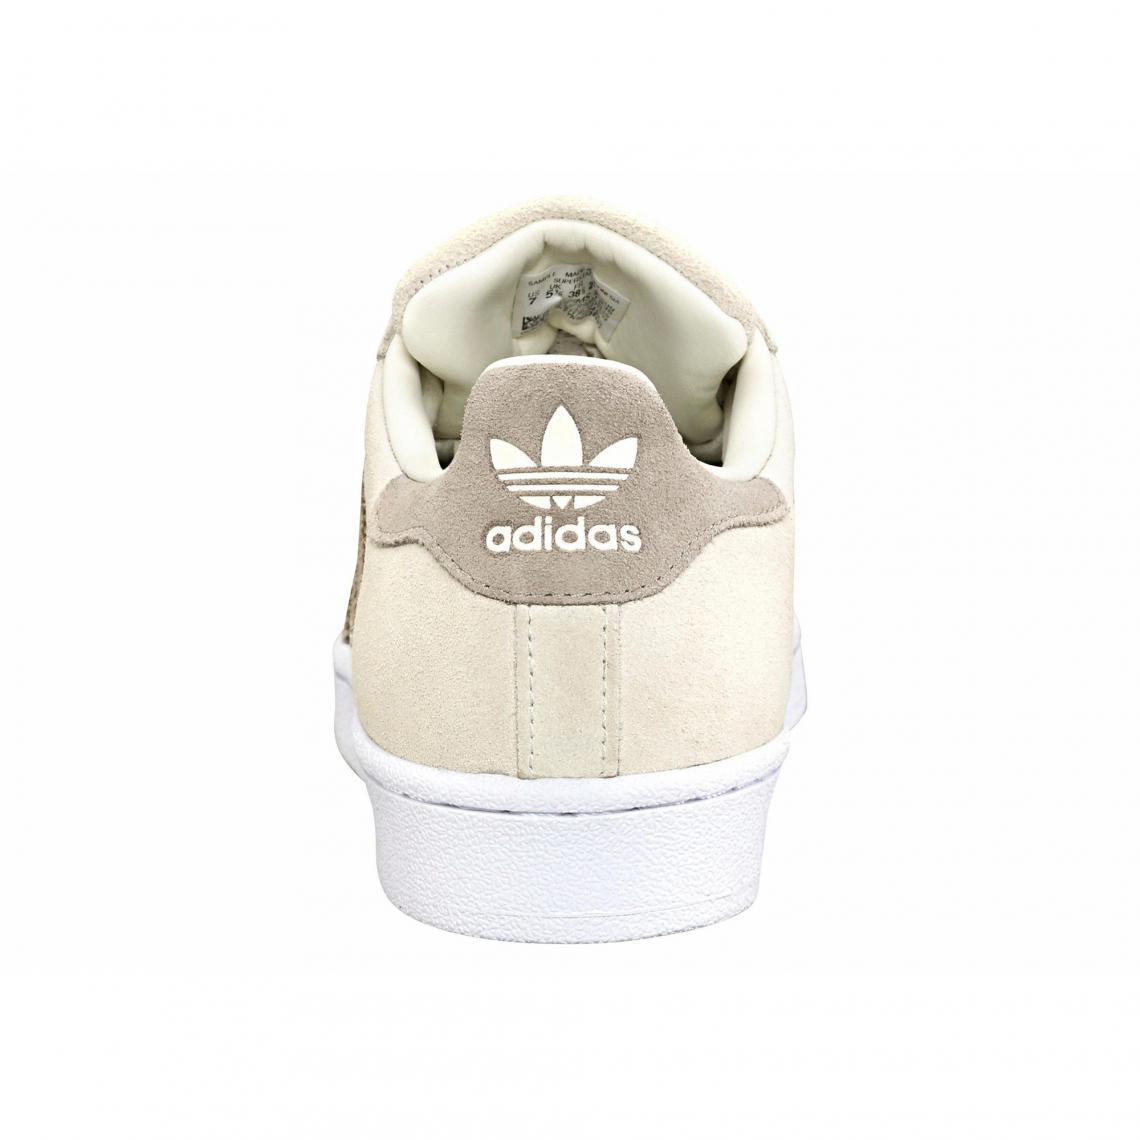 Adidas W Originals Sneaker Sport Femme Superstar Chaussures De Pour rCeBoxdW